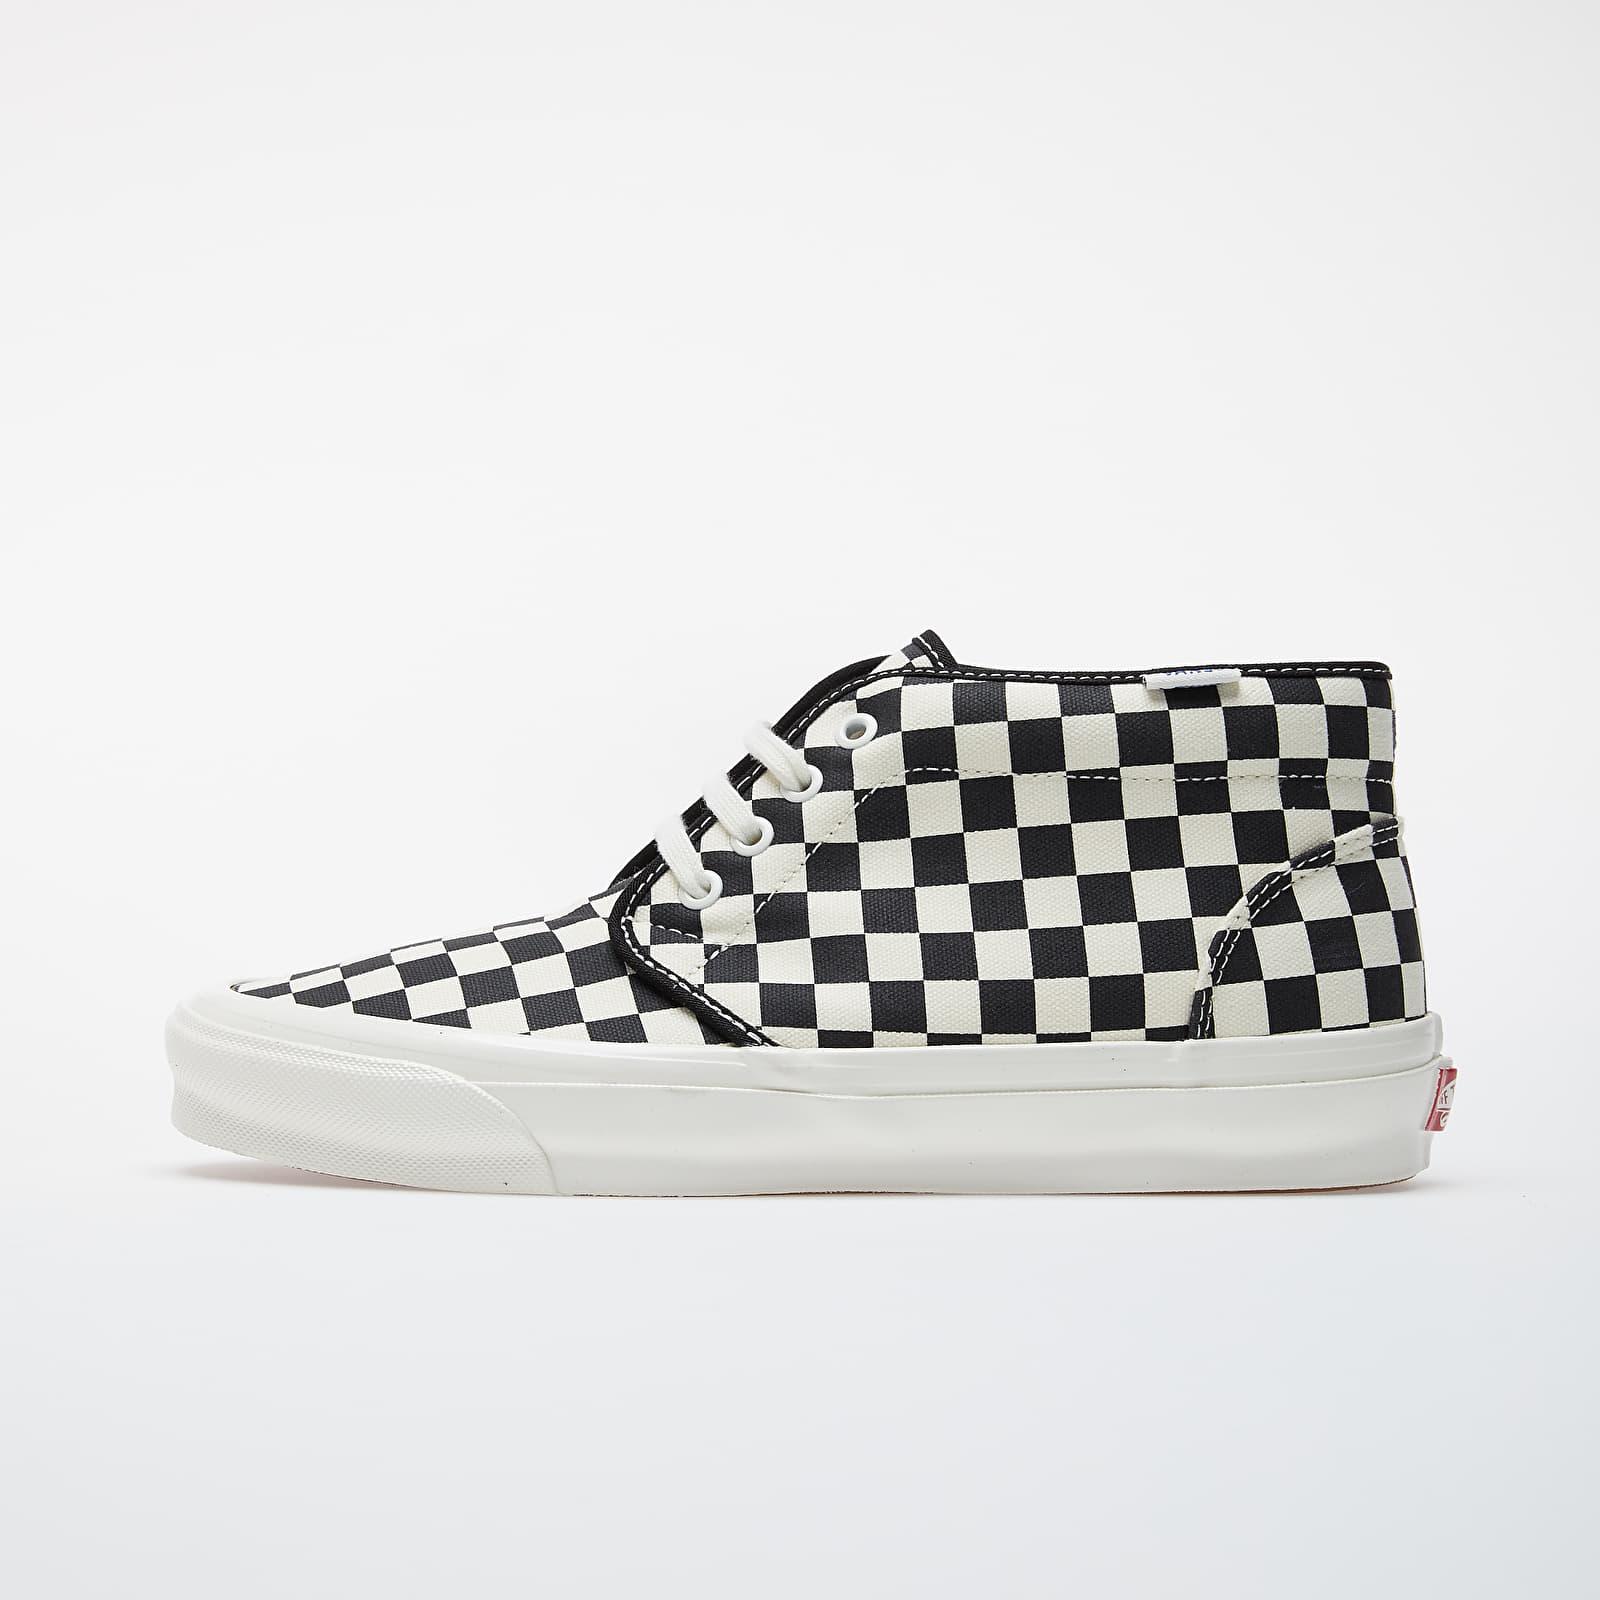 Férfi cipők Vans OG Chukka LX (Canvas/ Checkerboard) Black/ White